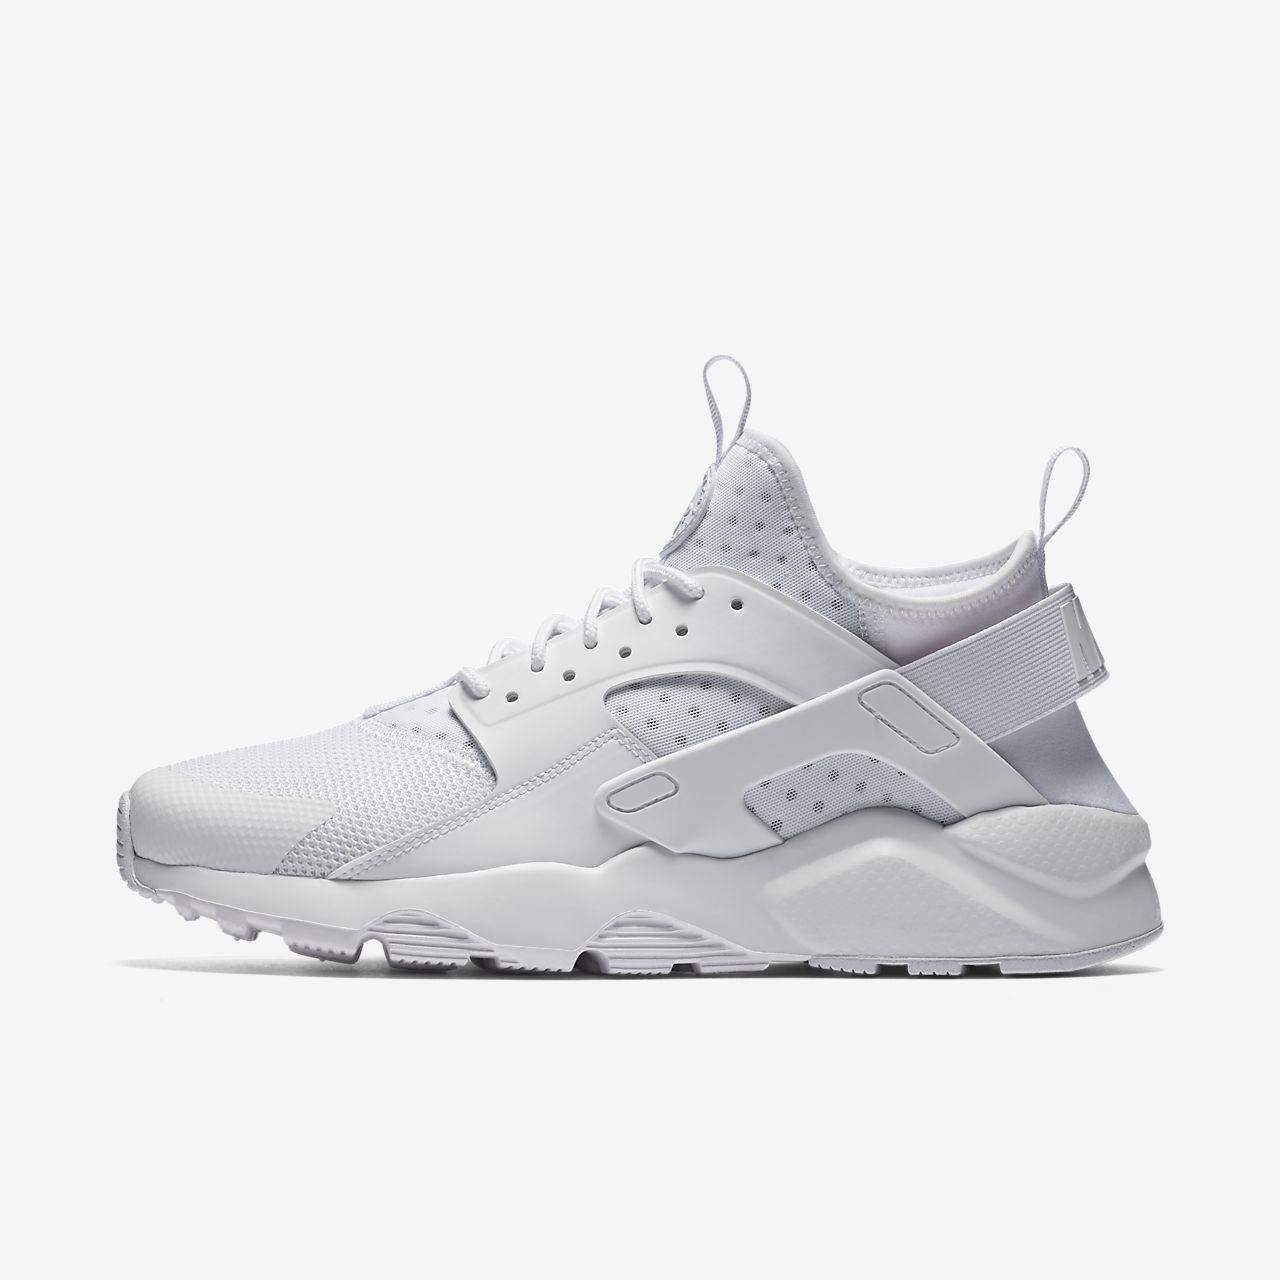 buy online 32ca9 b5646 ... Nike Air Huarache Ultra-herresko